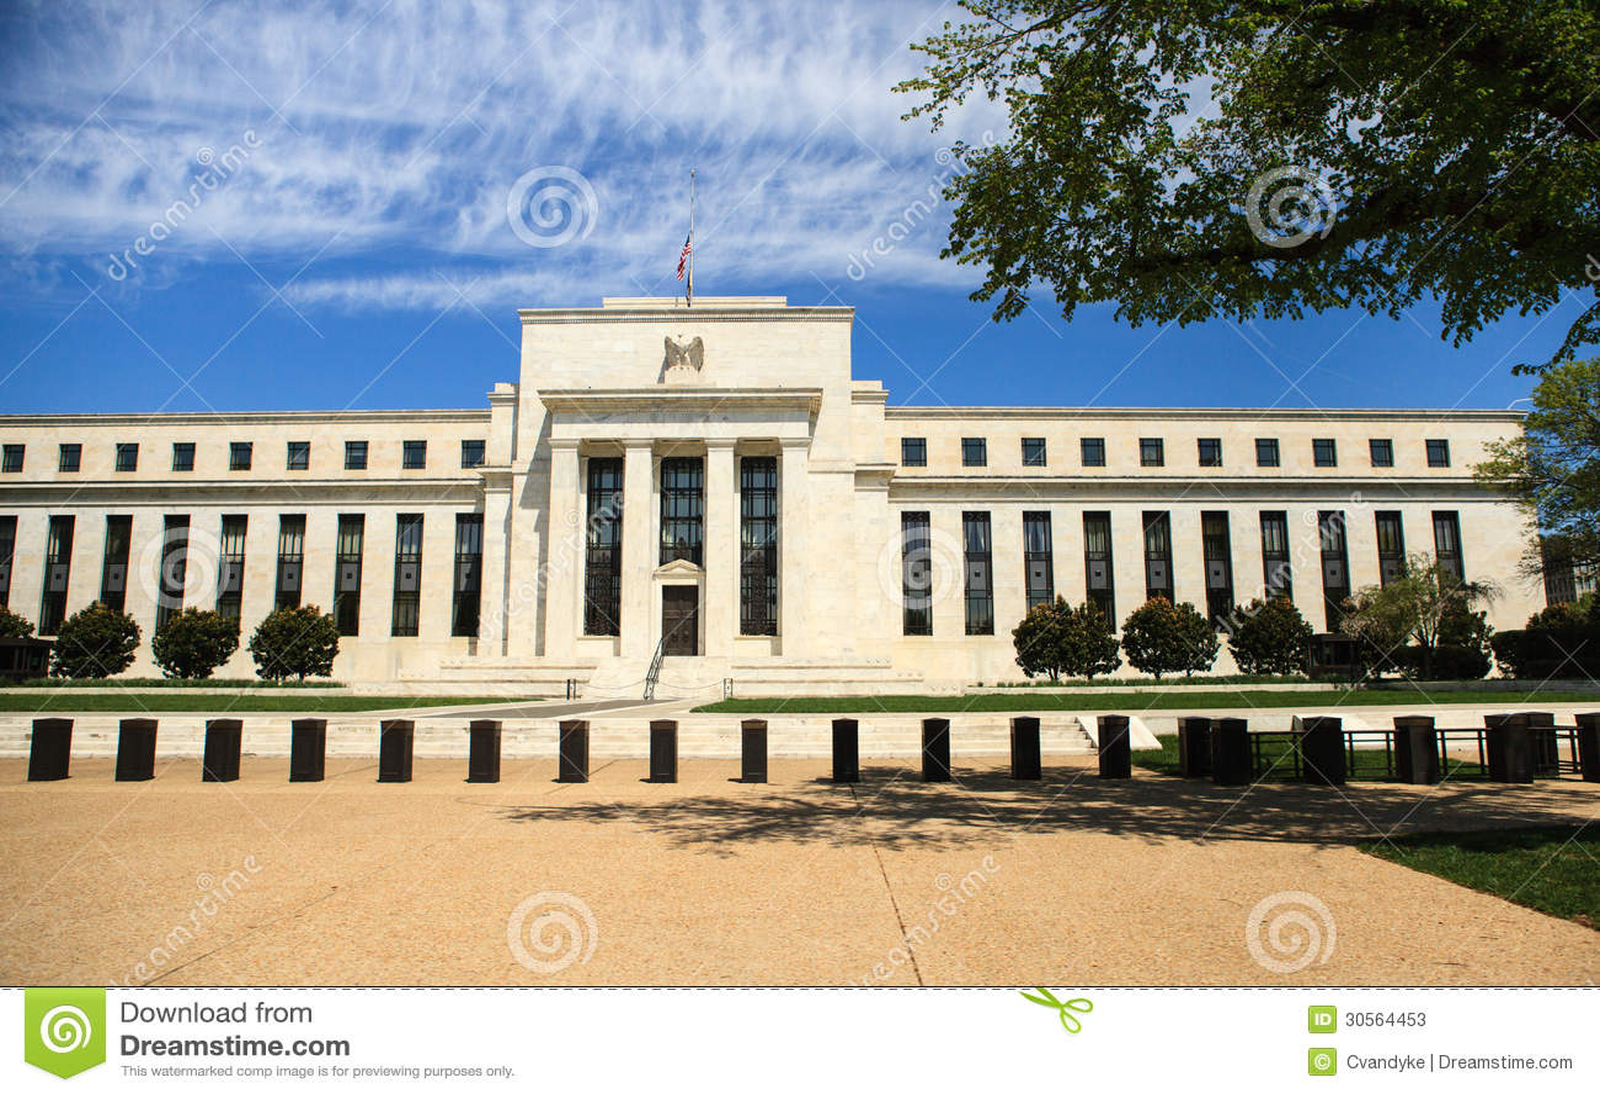 Federal Reserve Building Washington Dc Stock Photos